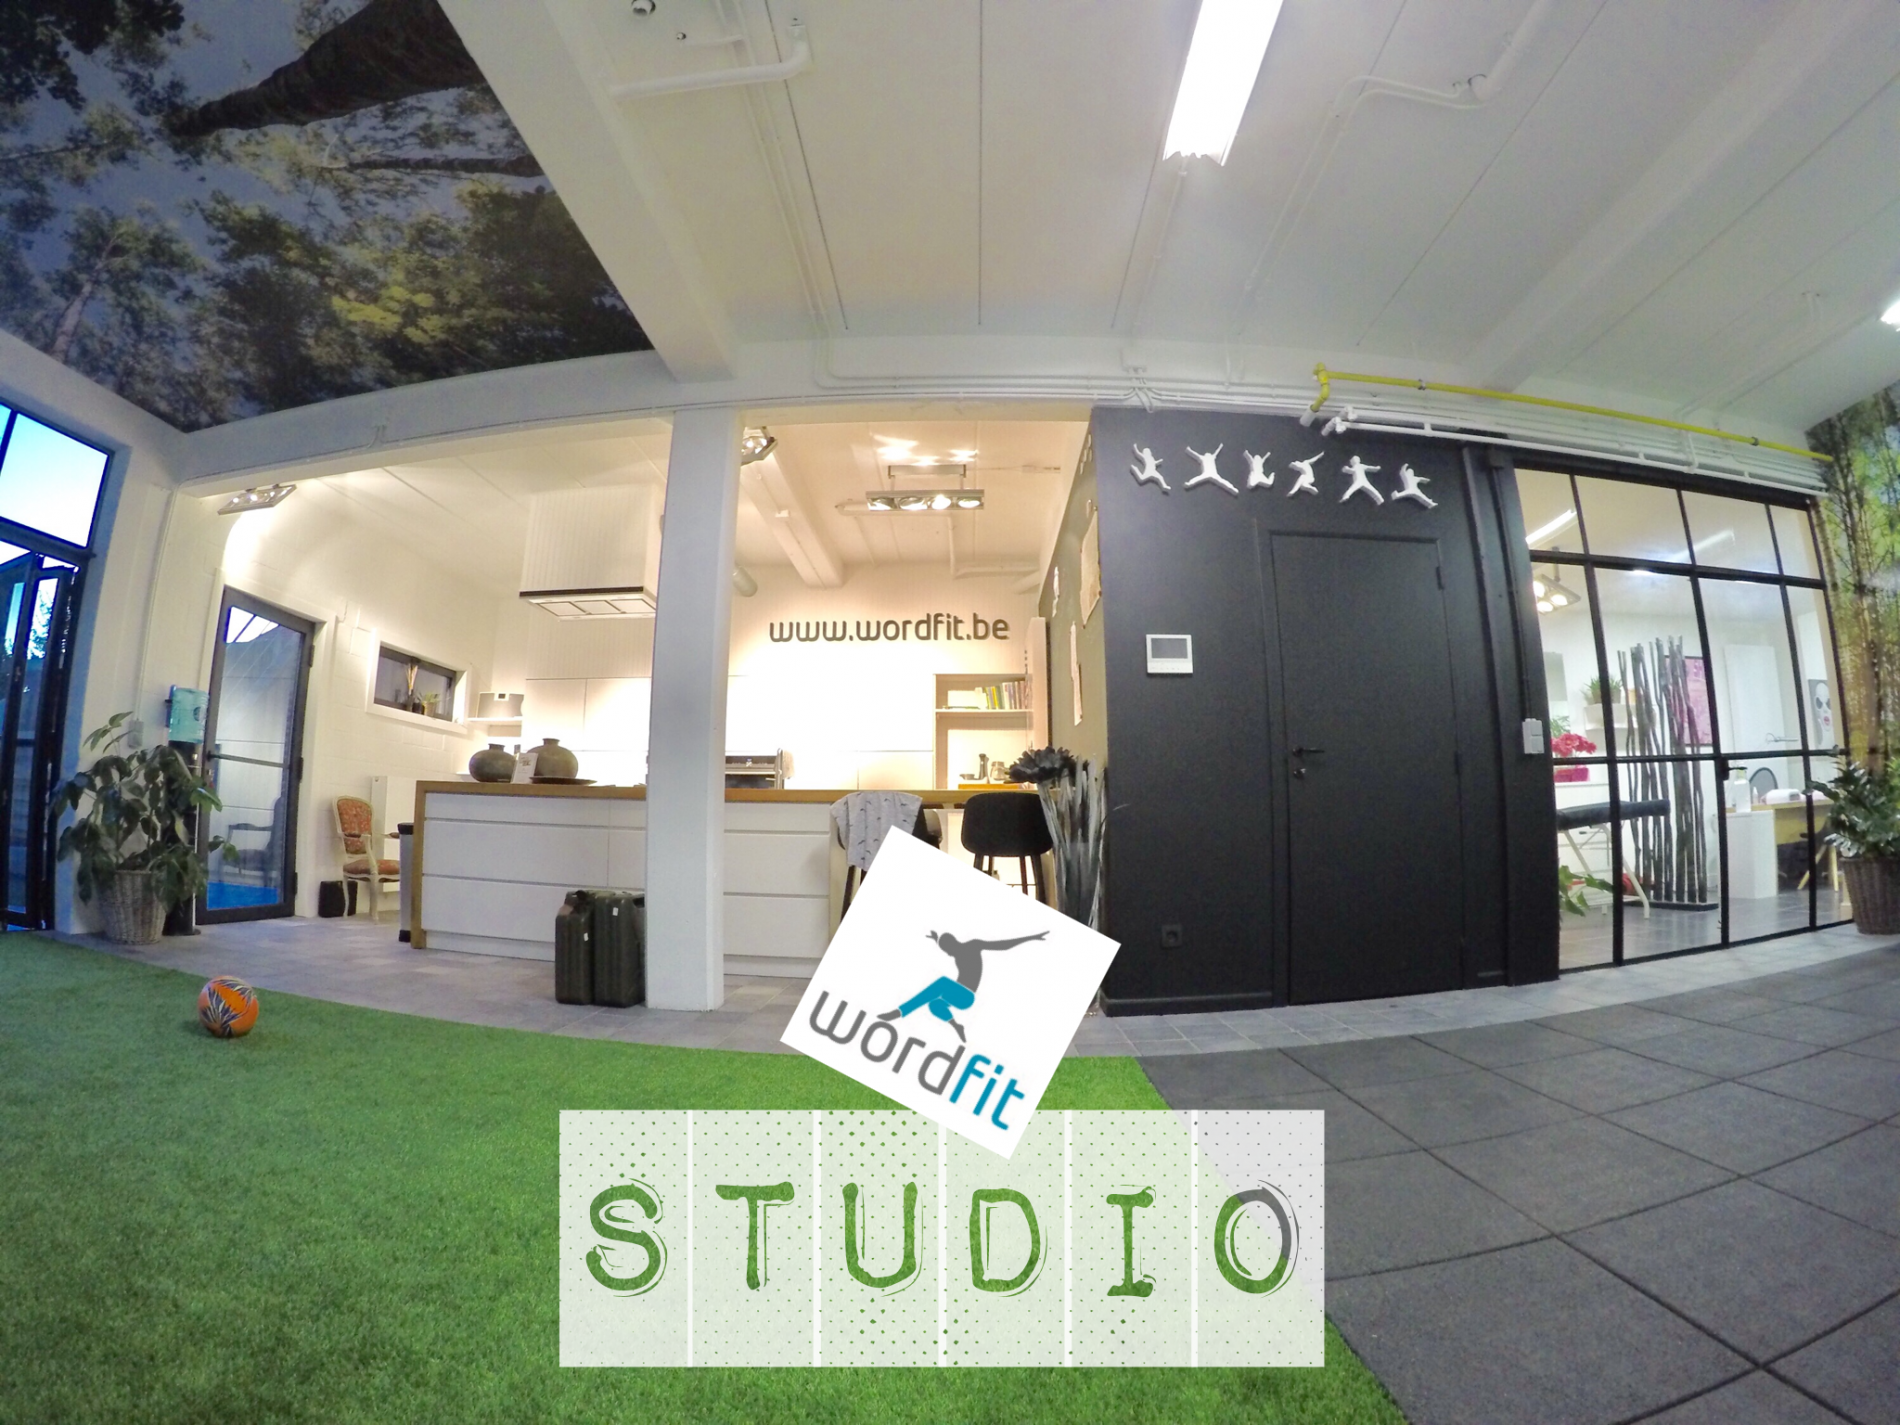 Personal training in WordFit-studio Bouwel Grobbendonk Antwerpen